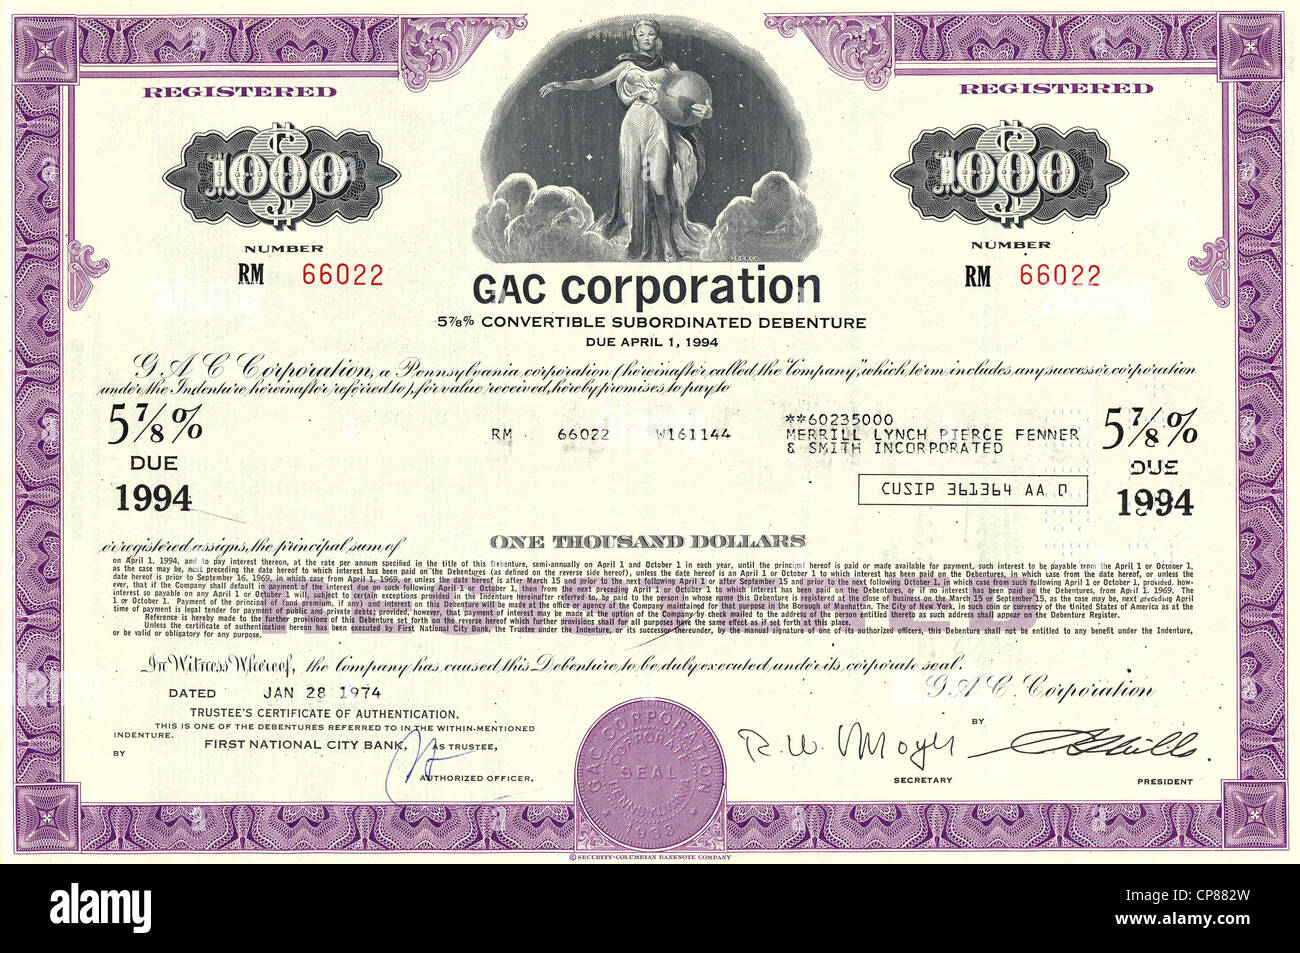 Historical stock certificate, mining company, GAC Corporation, Golden Arrow Resources Corporation, Pennsylvania, - Stock Image